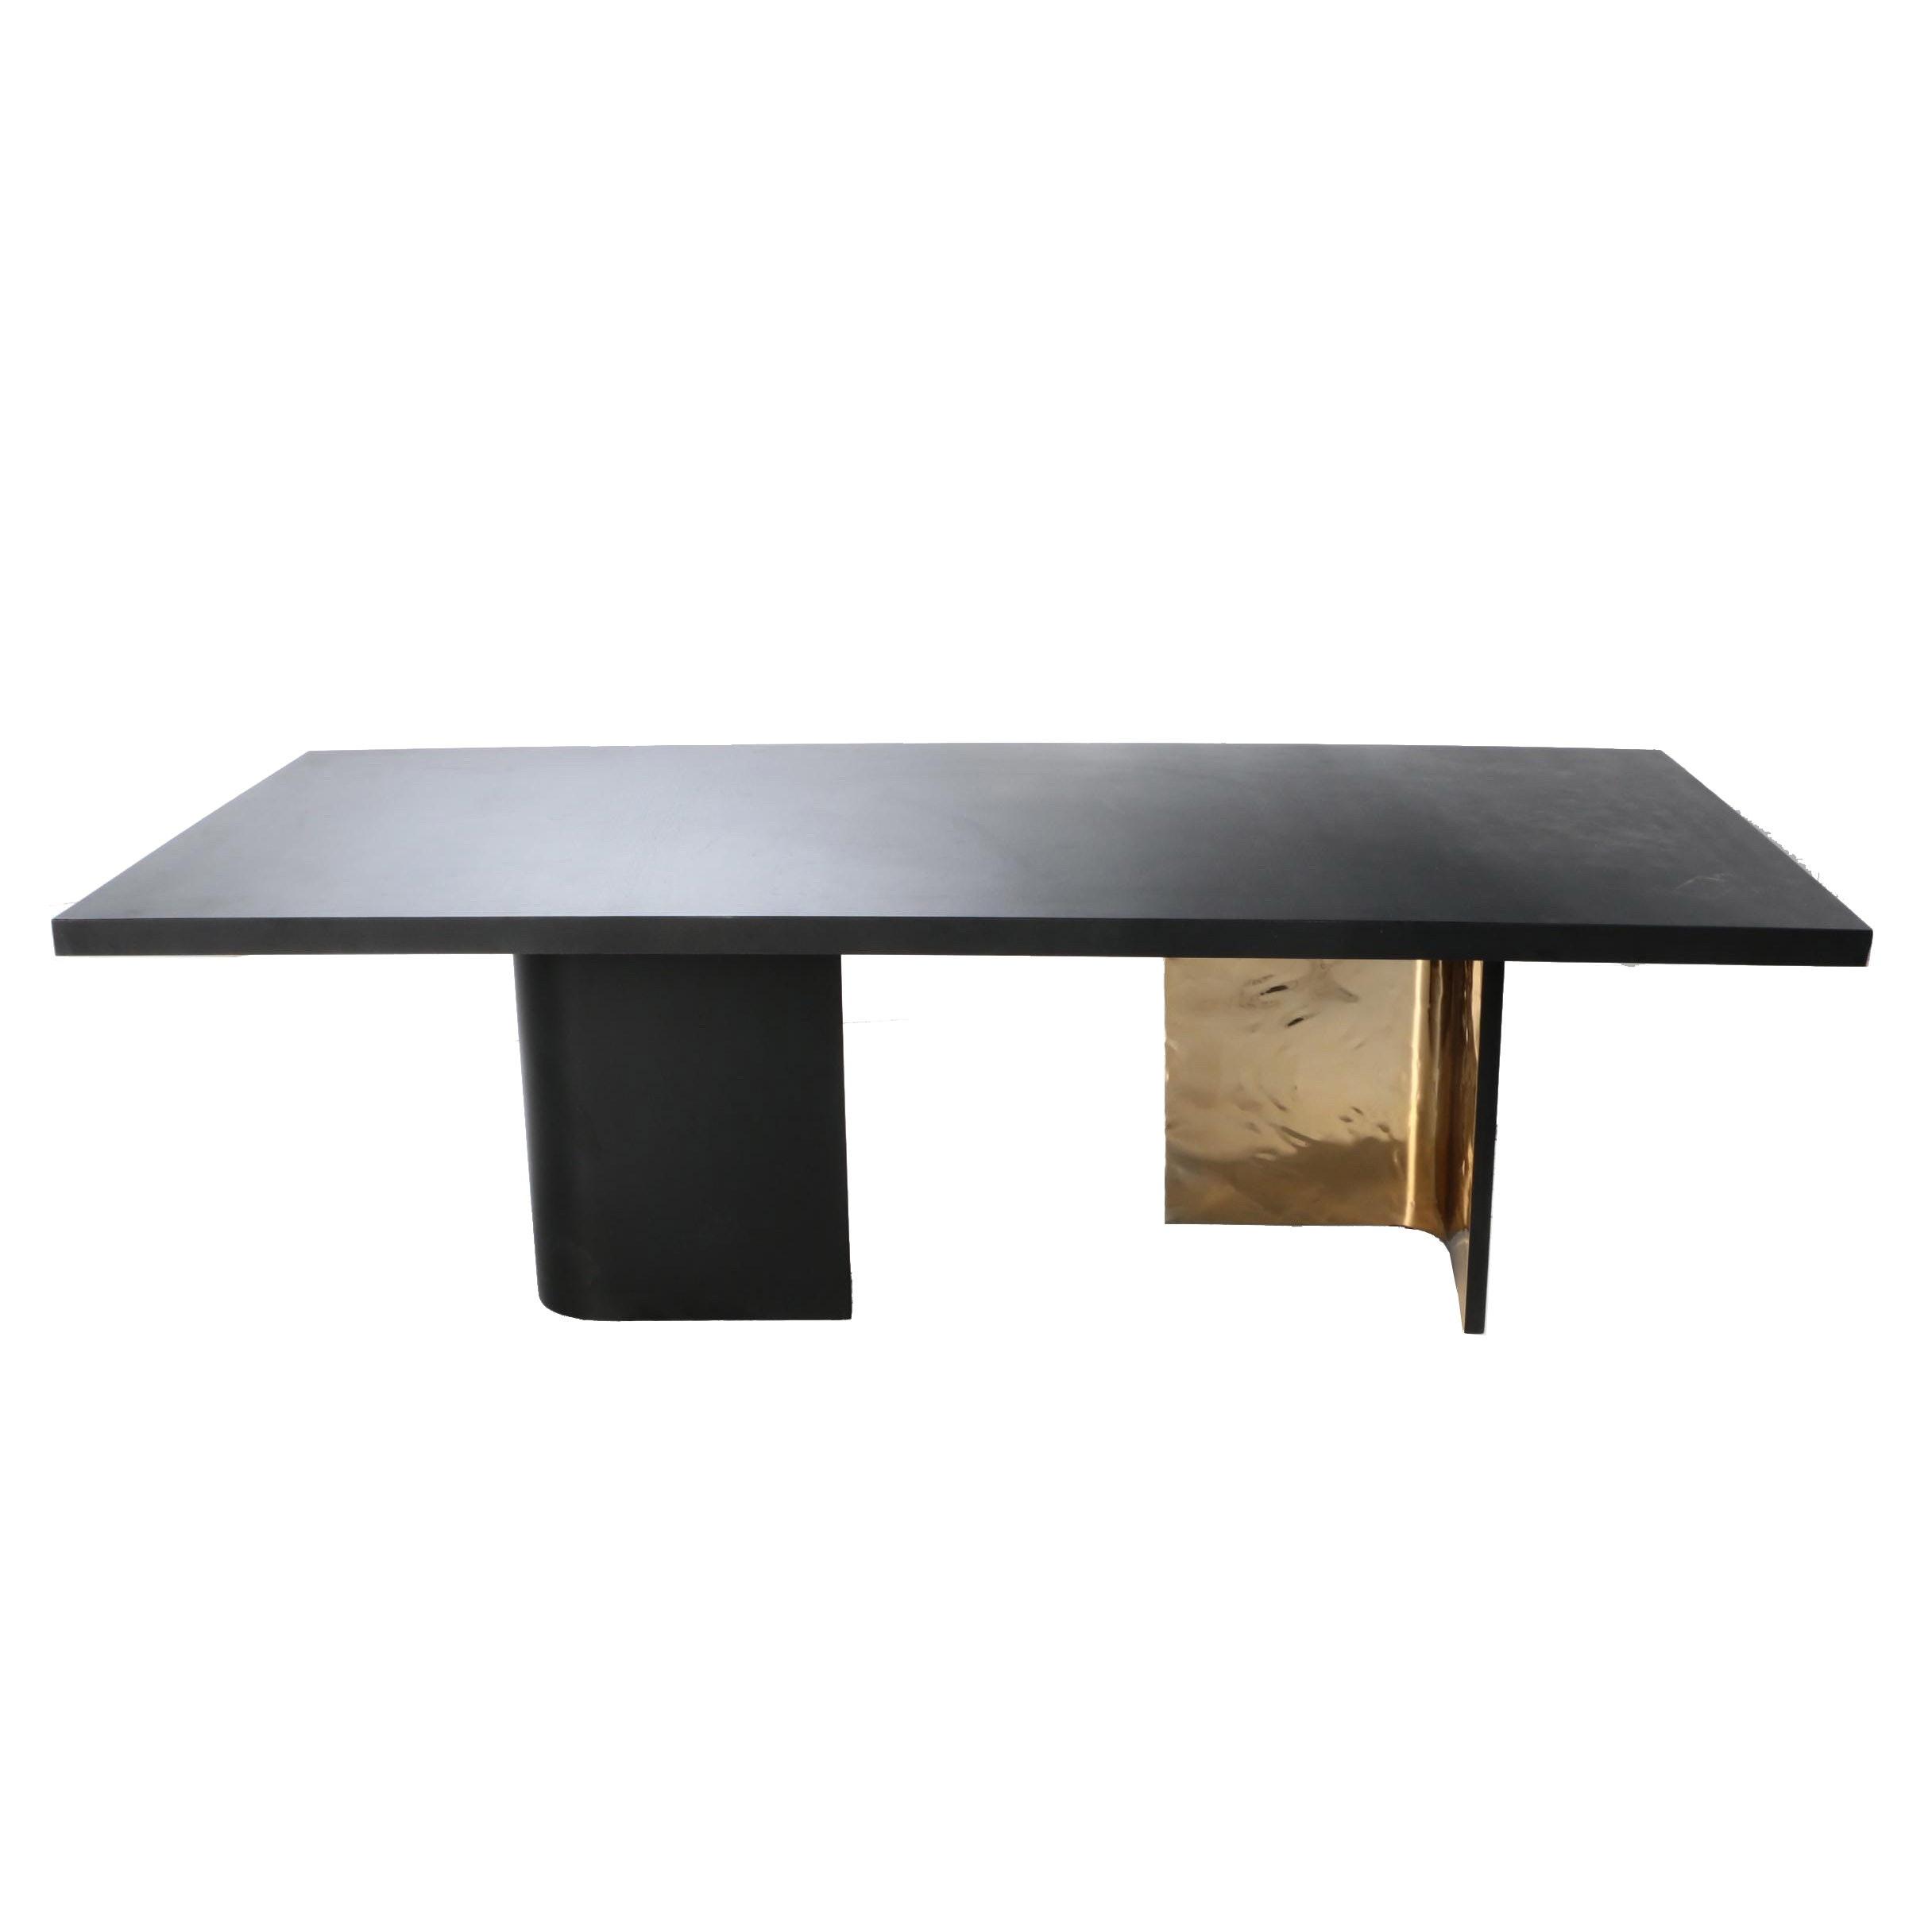 "Baker Furniture ""Liquid"" Dining Table by Kara Mann"